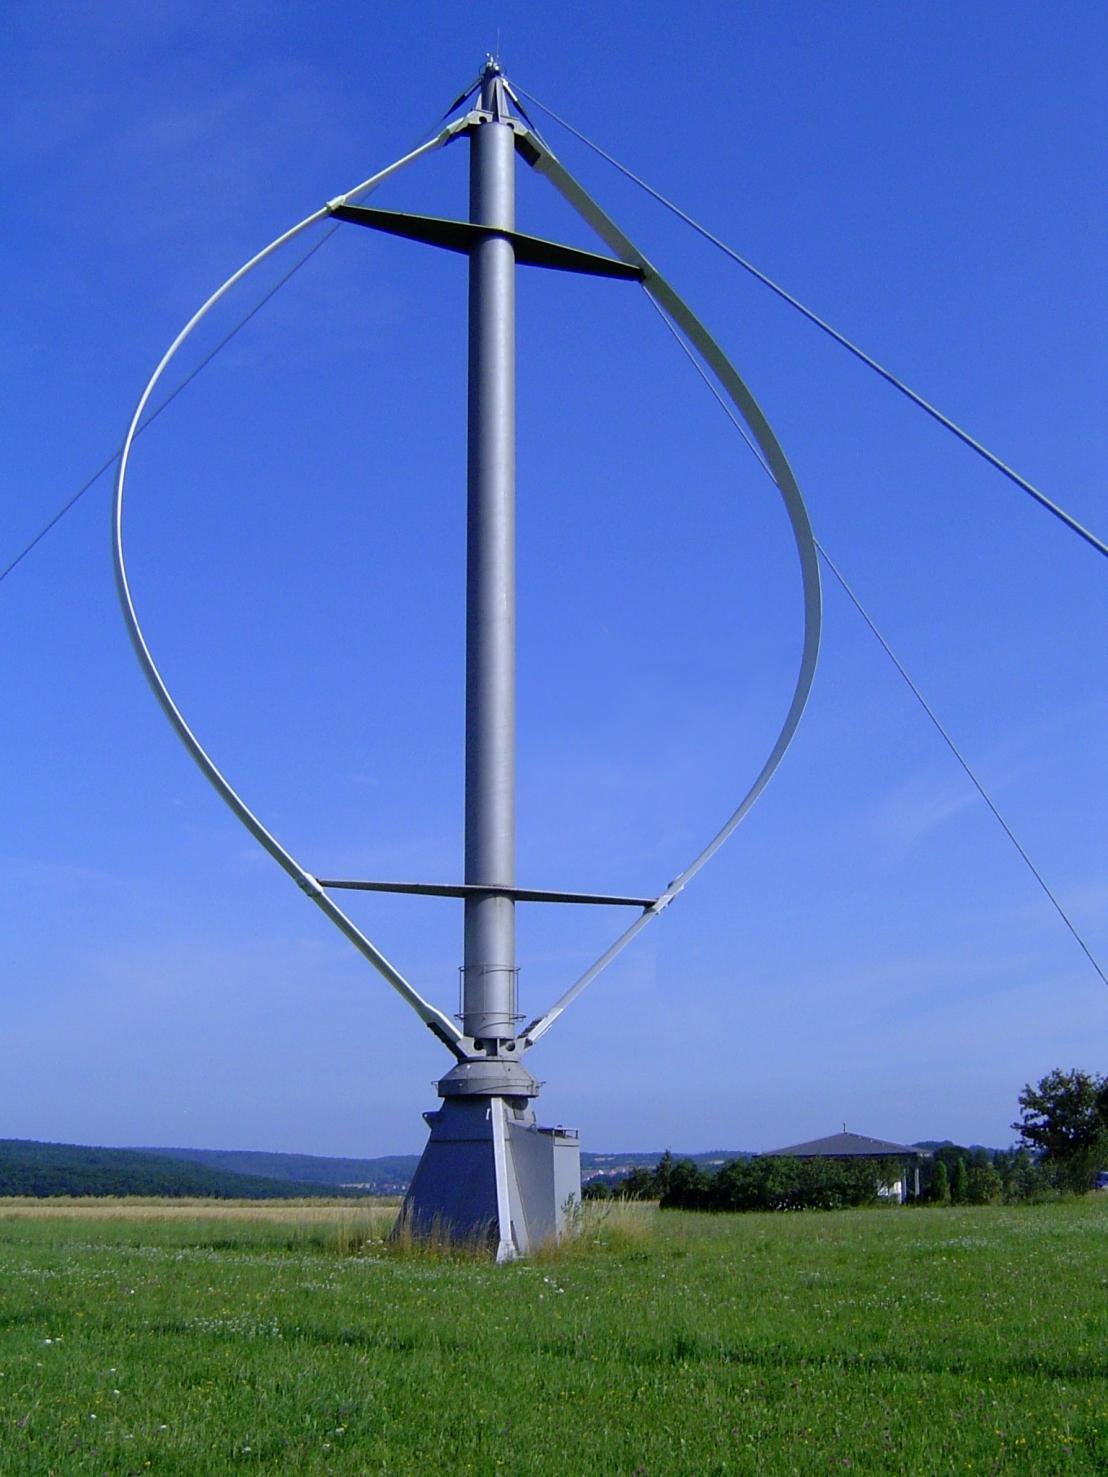 Vertical axis windturbines